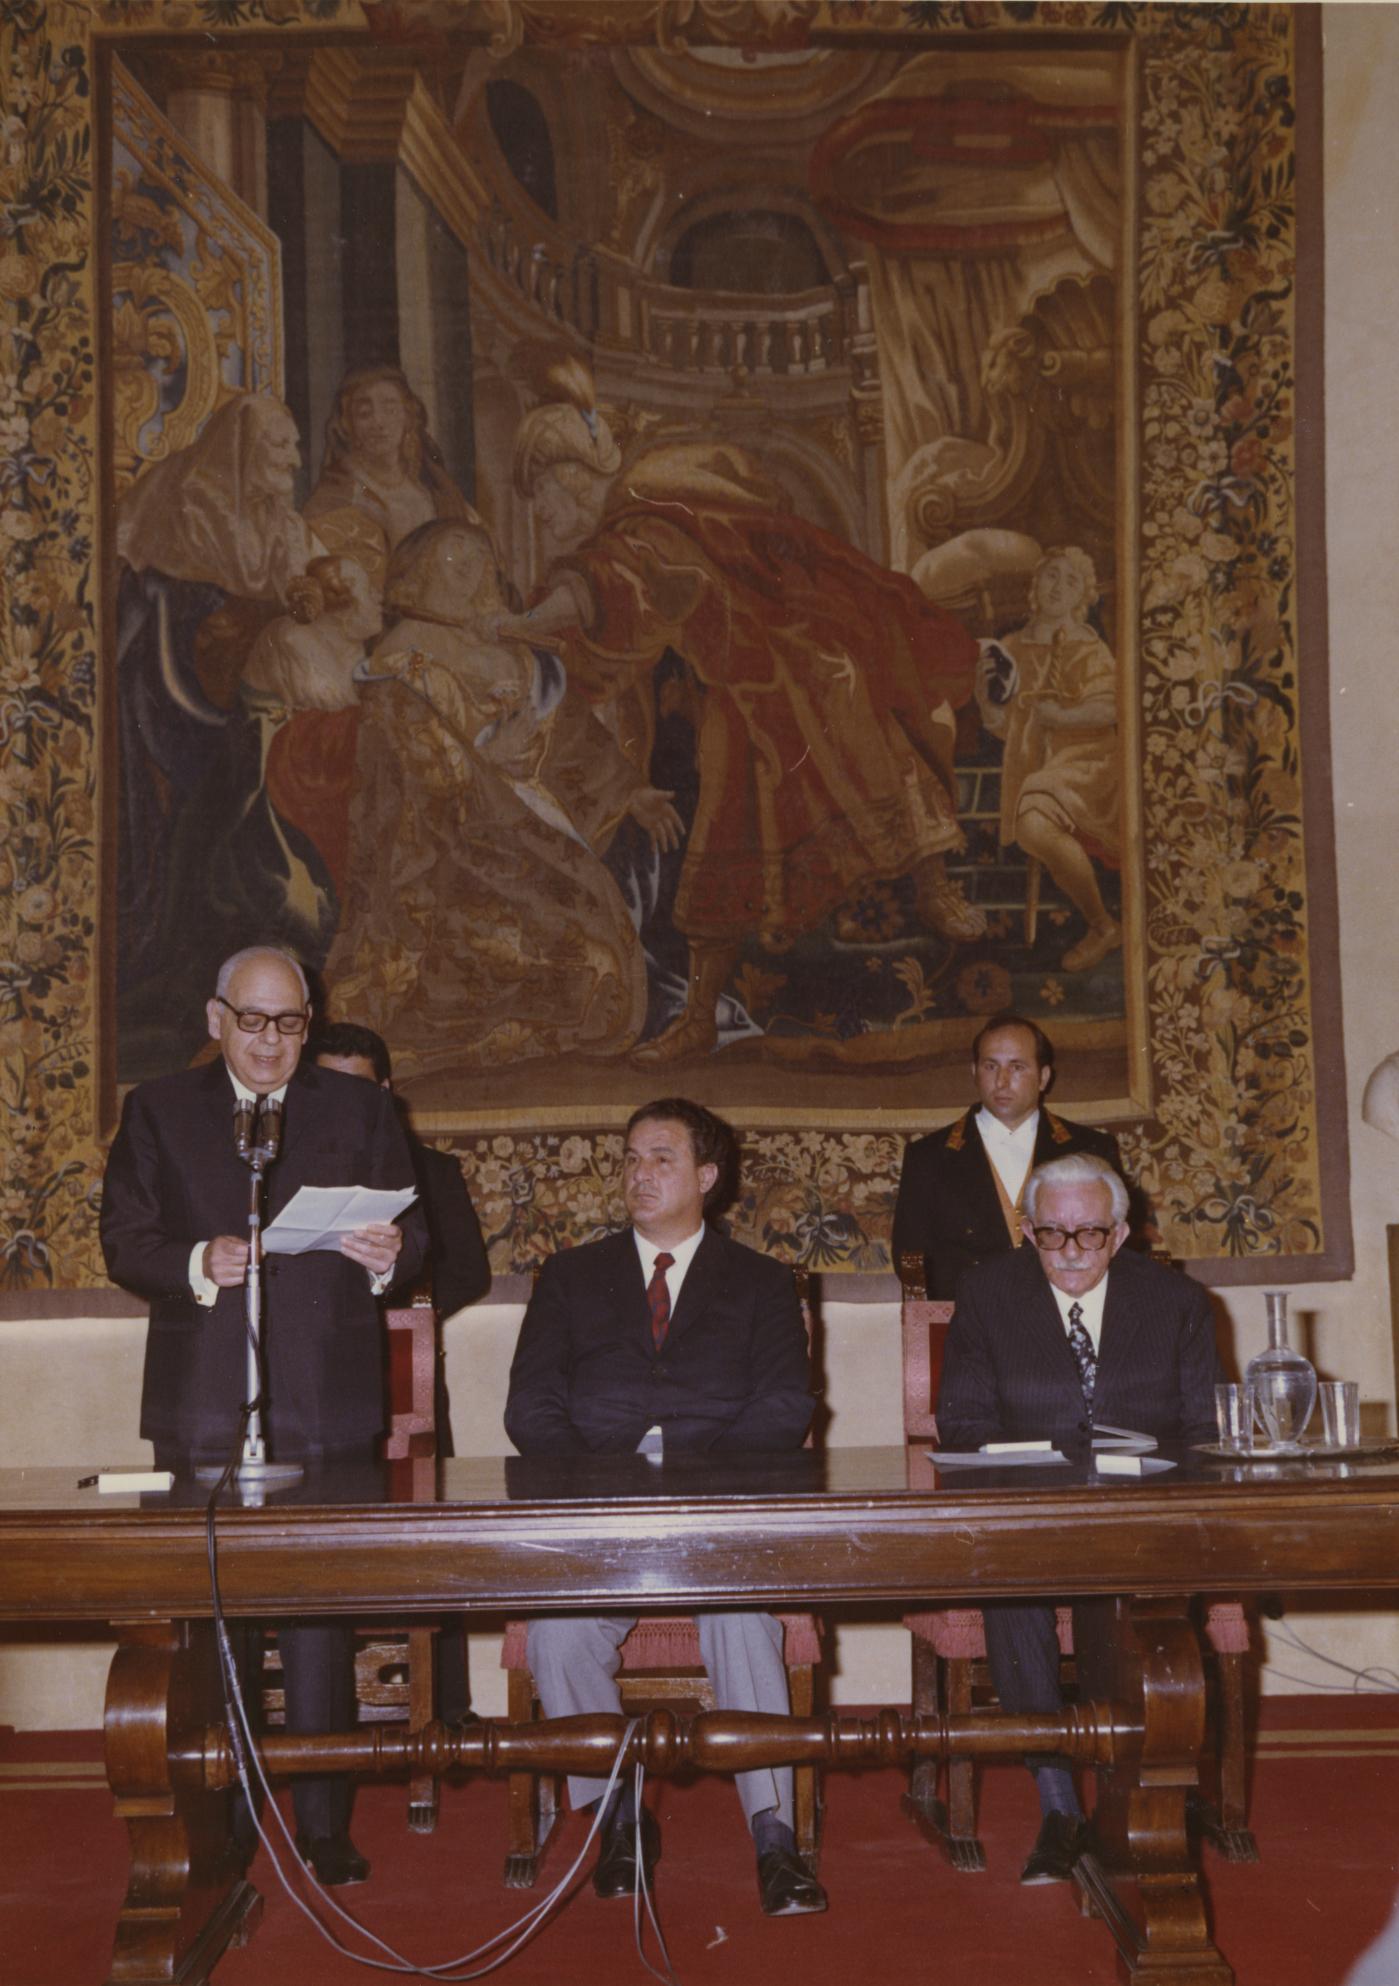 A ceremony in honor of Odoardo Focherini, Rome 03.05.1971